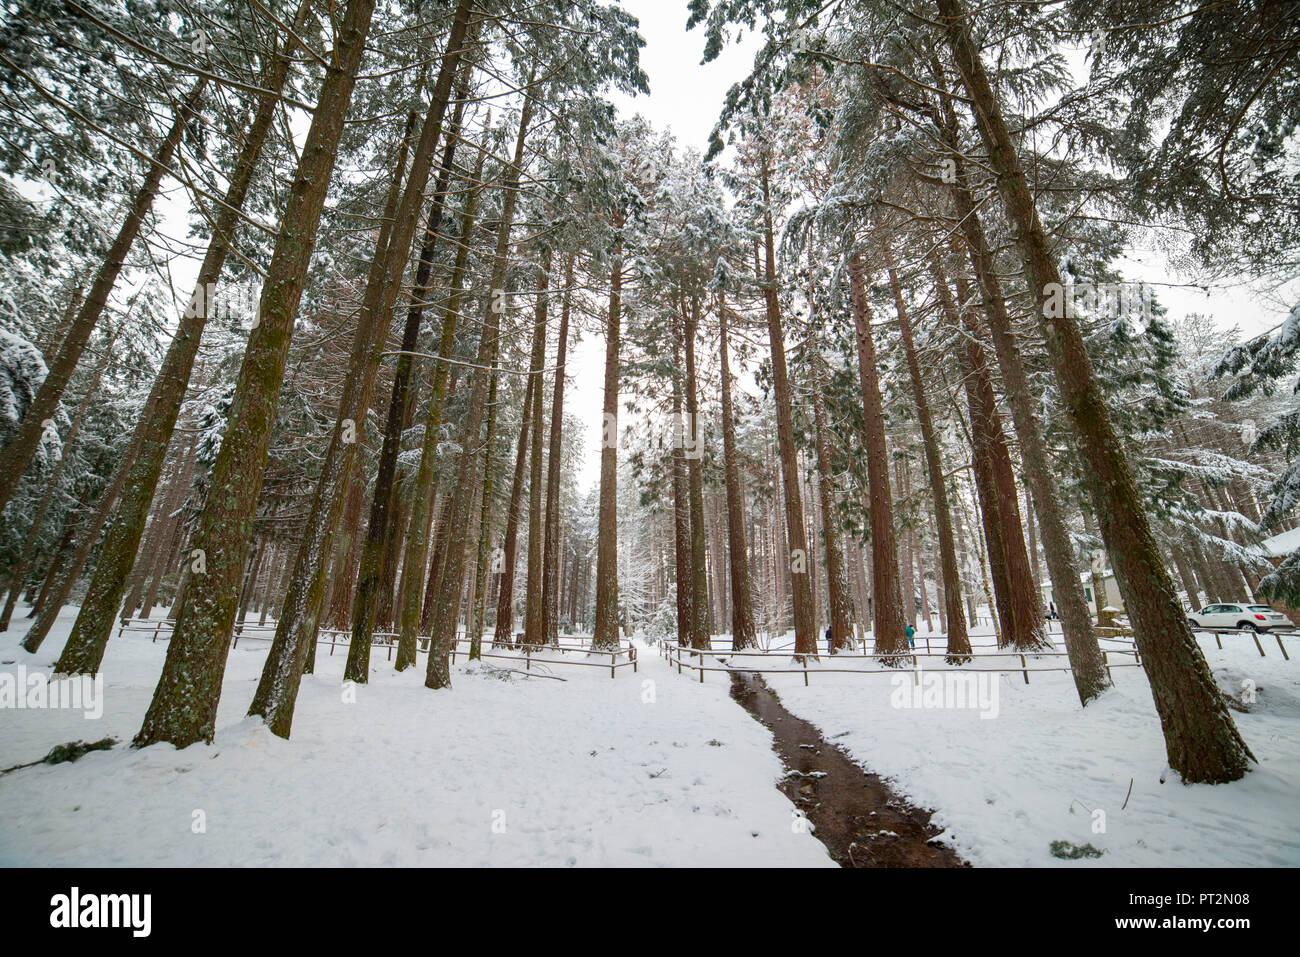 Snow in the forest, Limbara Mountain, Olbia Tempio Province, sardinia, italy, europe, - Stock Image